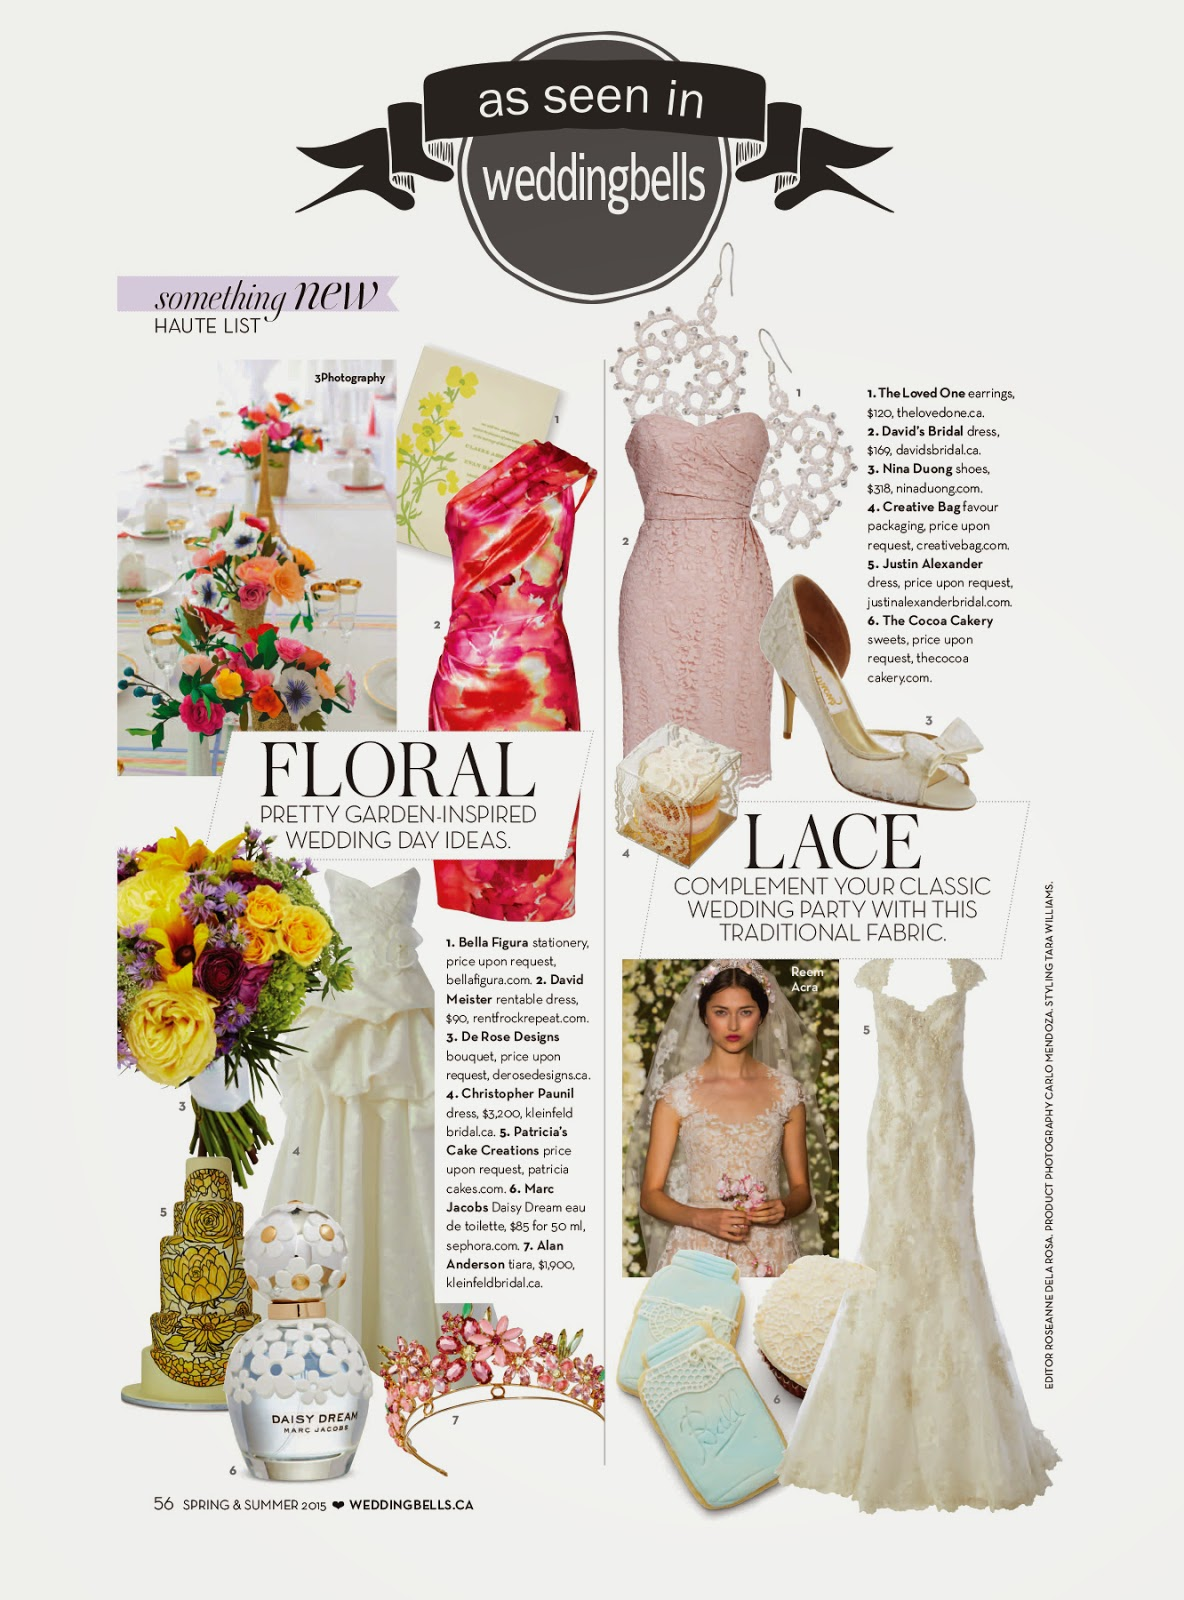 Creative Bag in the media - Weddingbells magazine